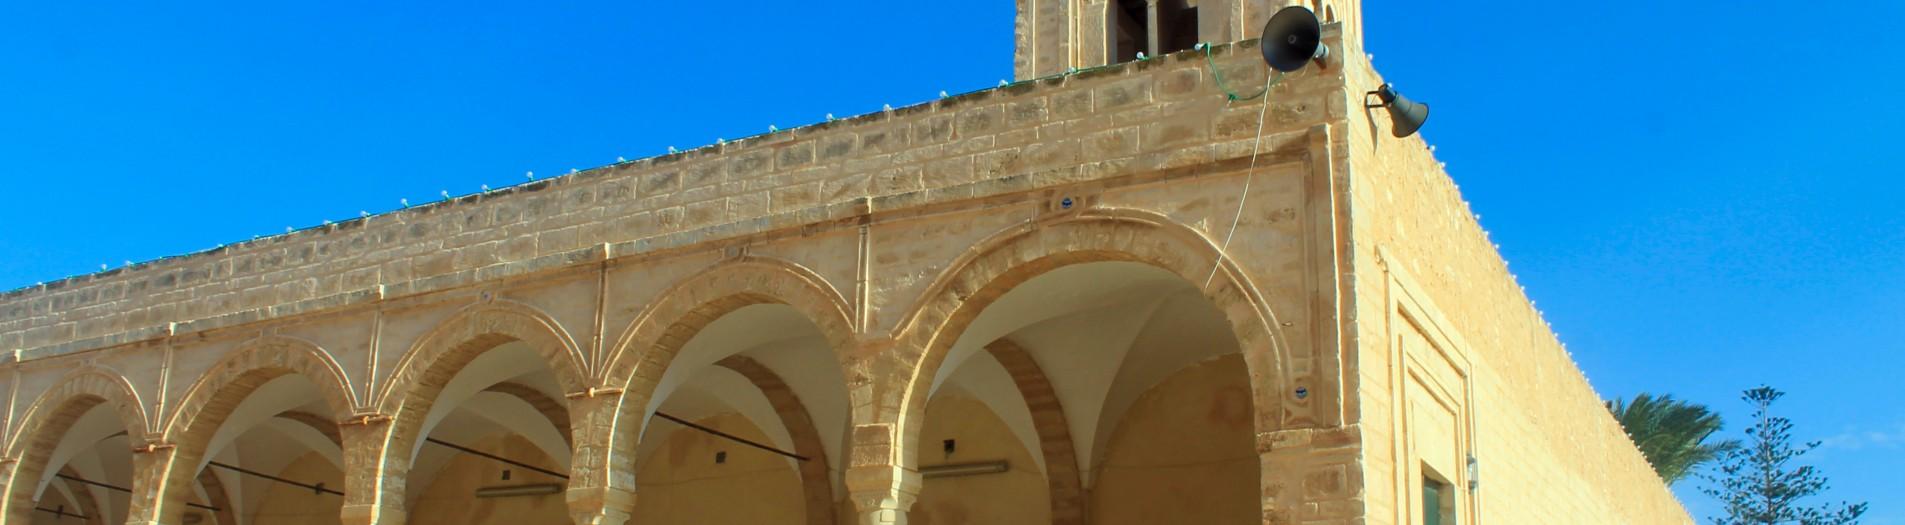 La grande mosquée de Monastir